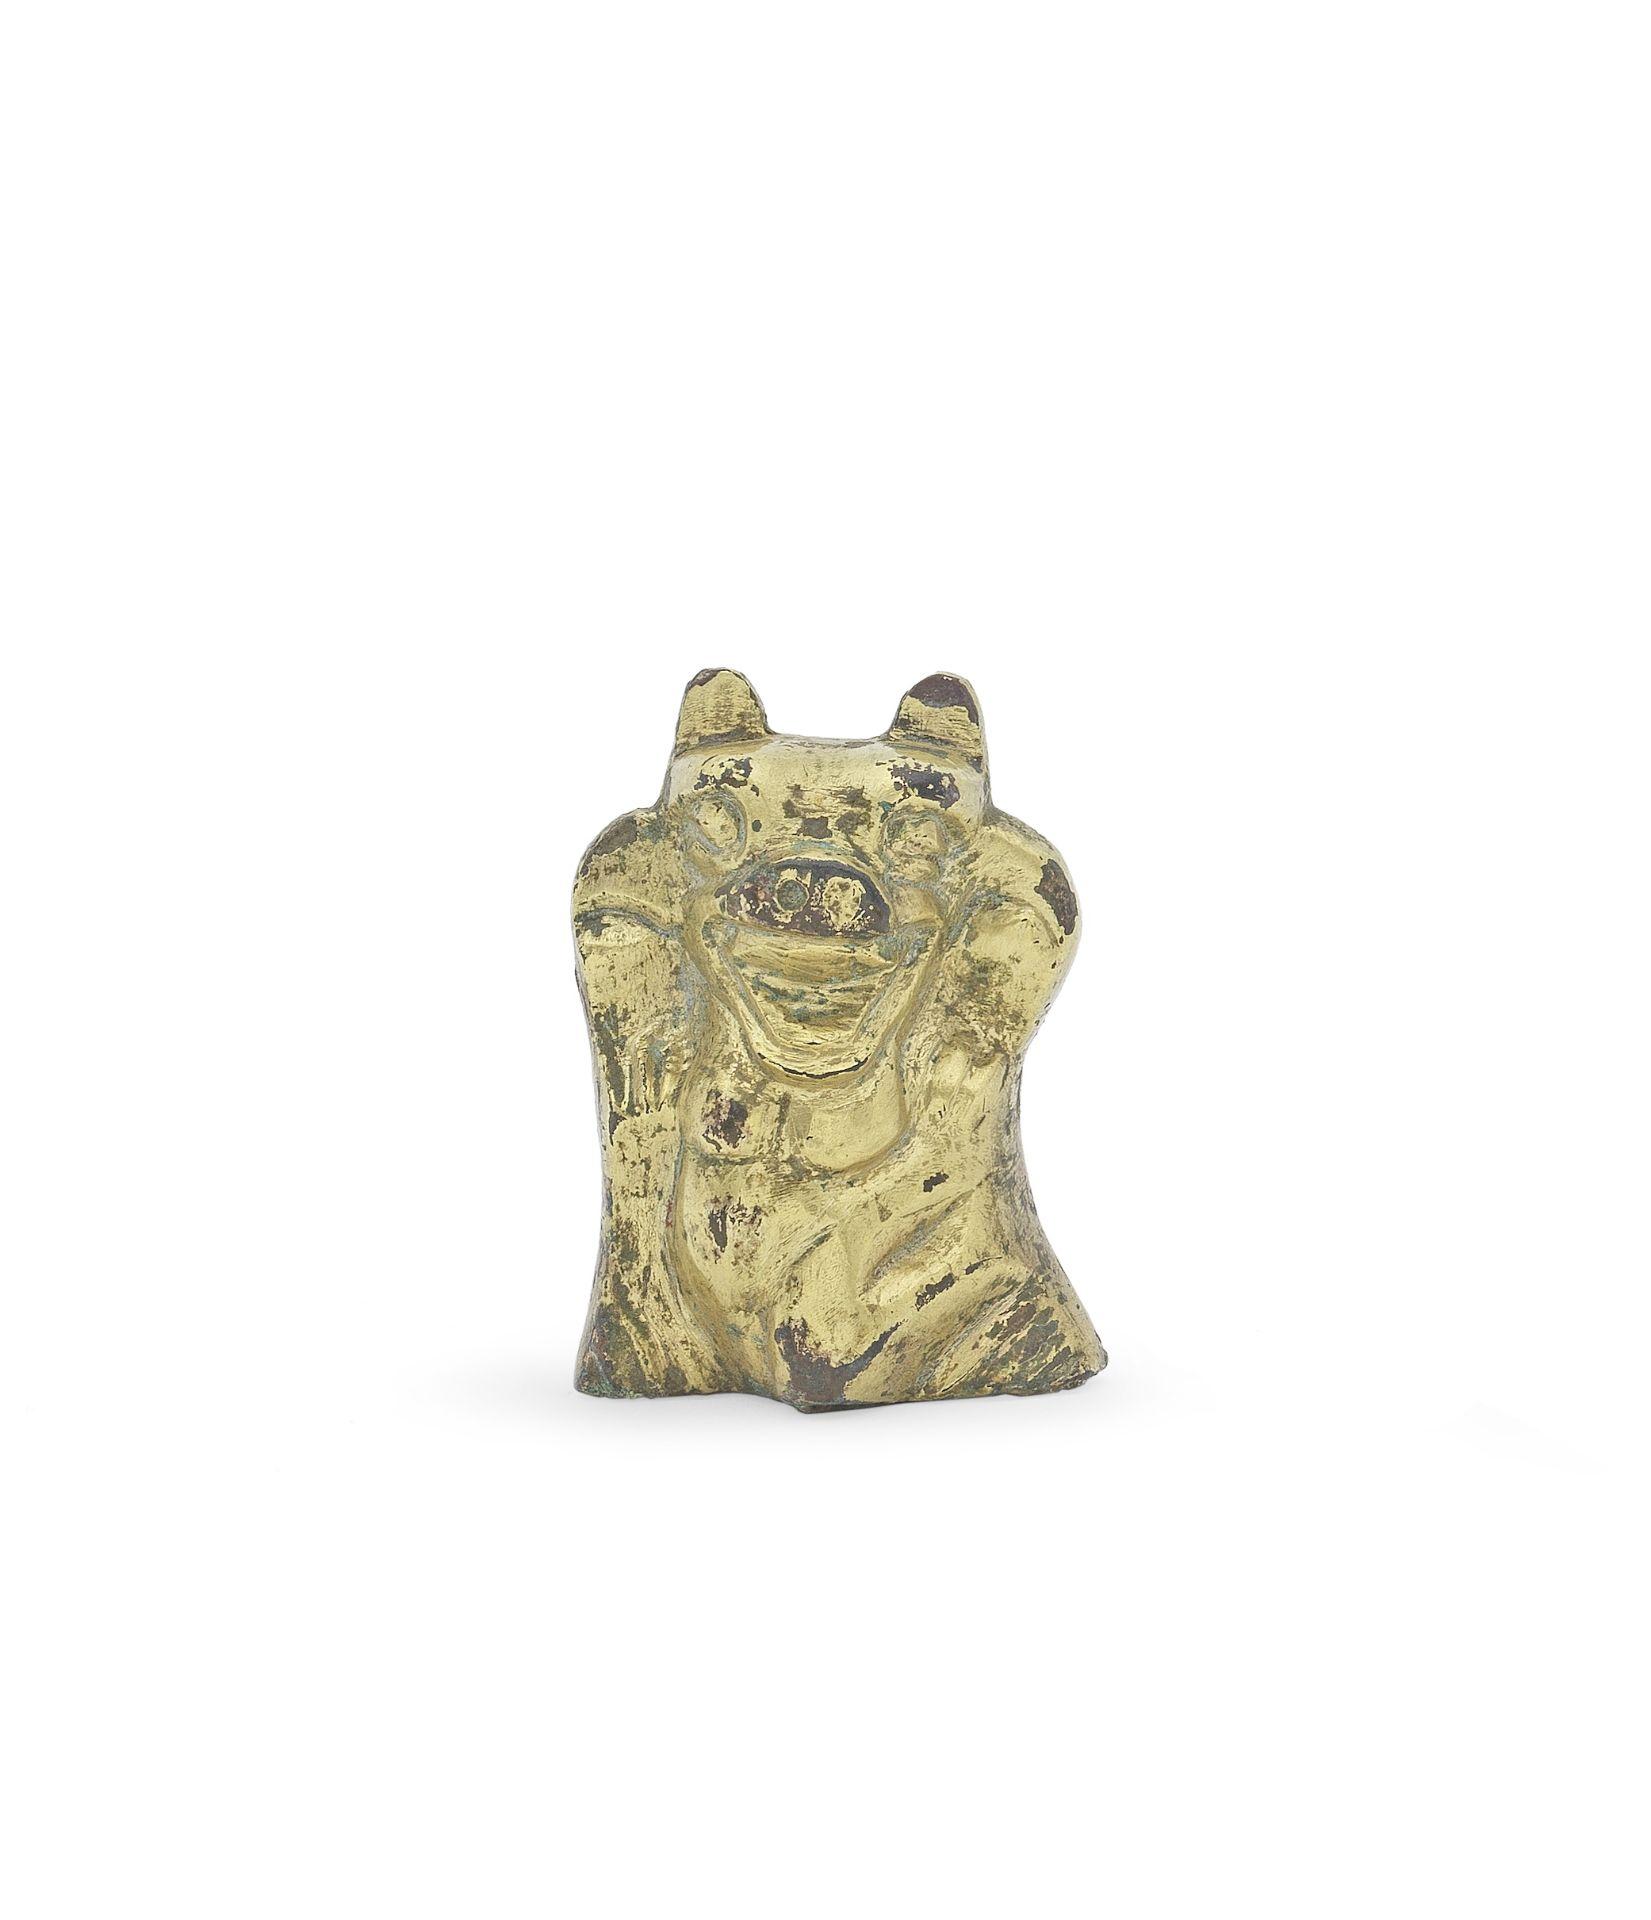 A RARE GILT-BRONZE BEAR-SHAPED SUPPORT Han Dynasty